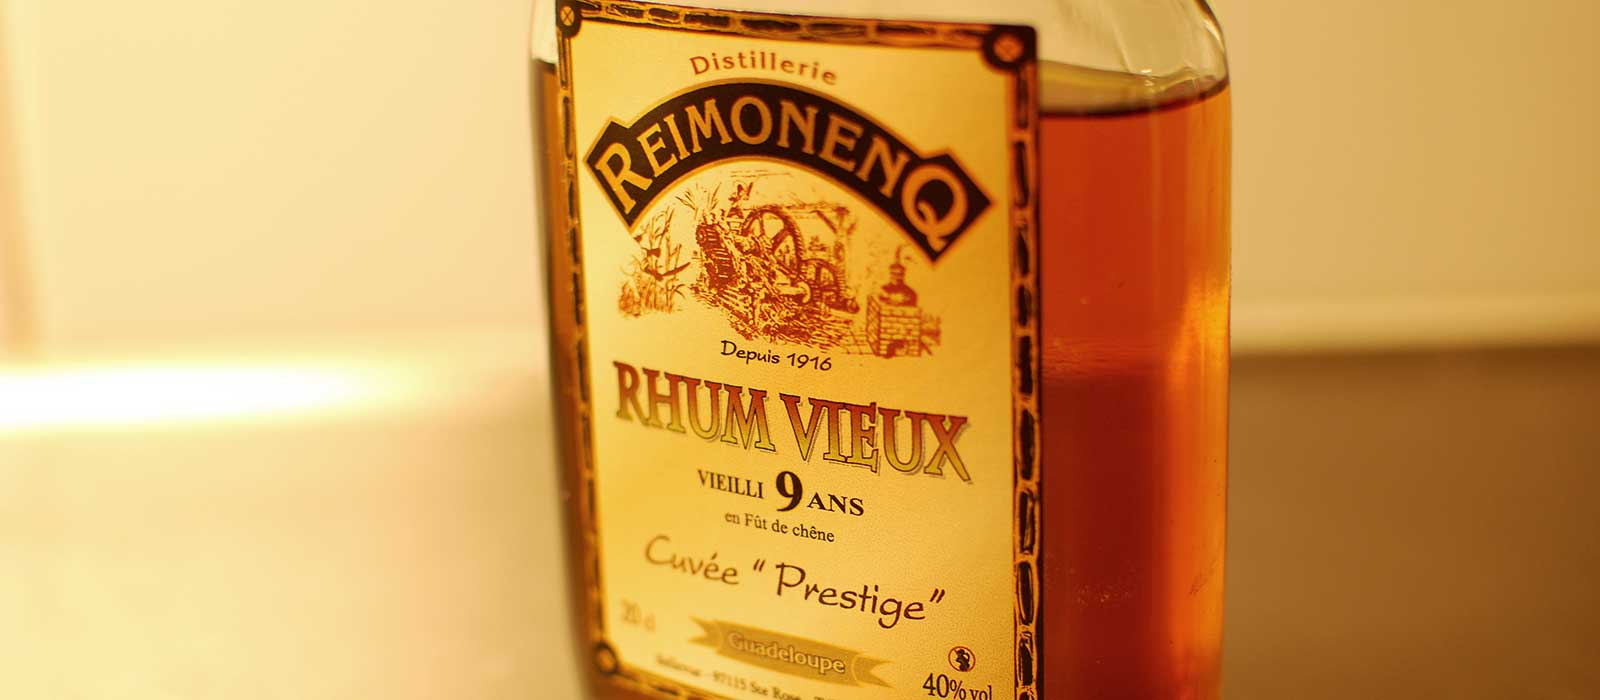 Månadens rom juli 2016– Reimonenq Cuvée Prestige 9